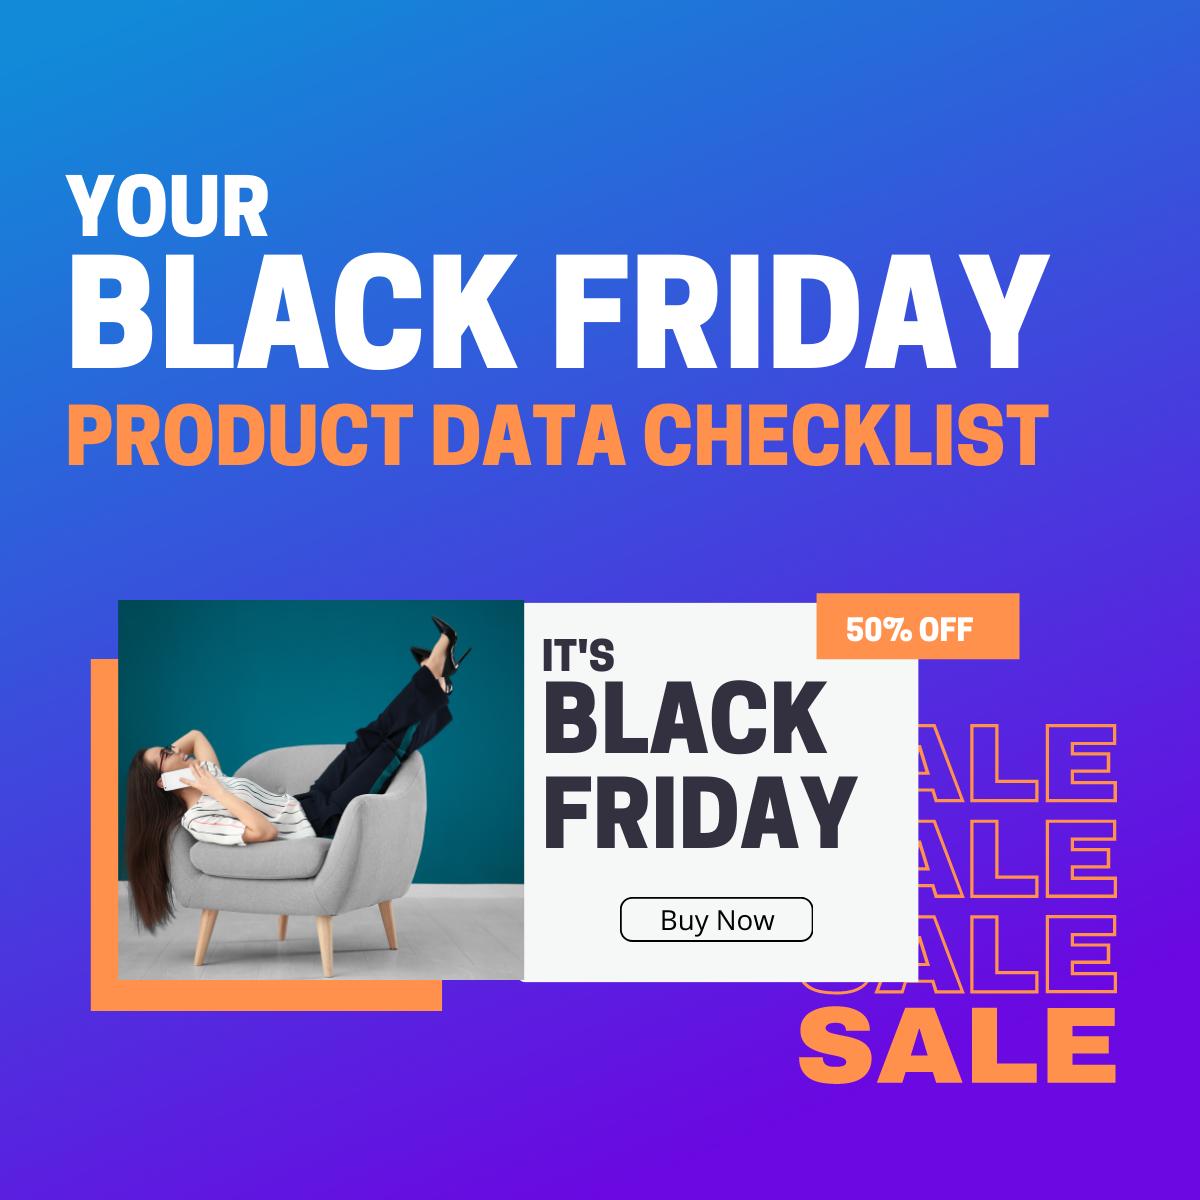 Black Friday Product Data Checklist